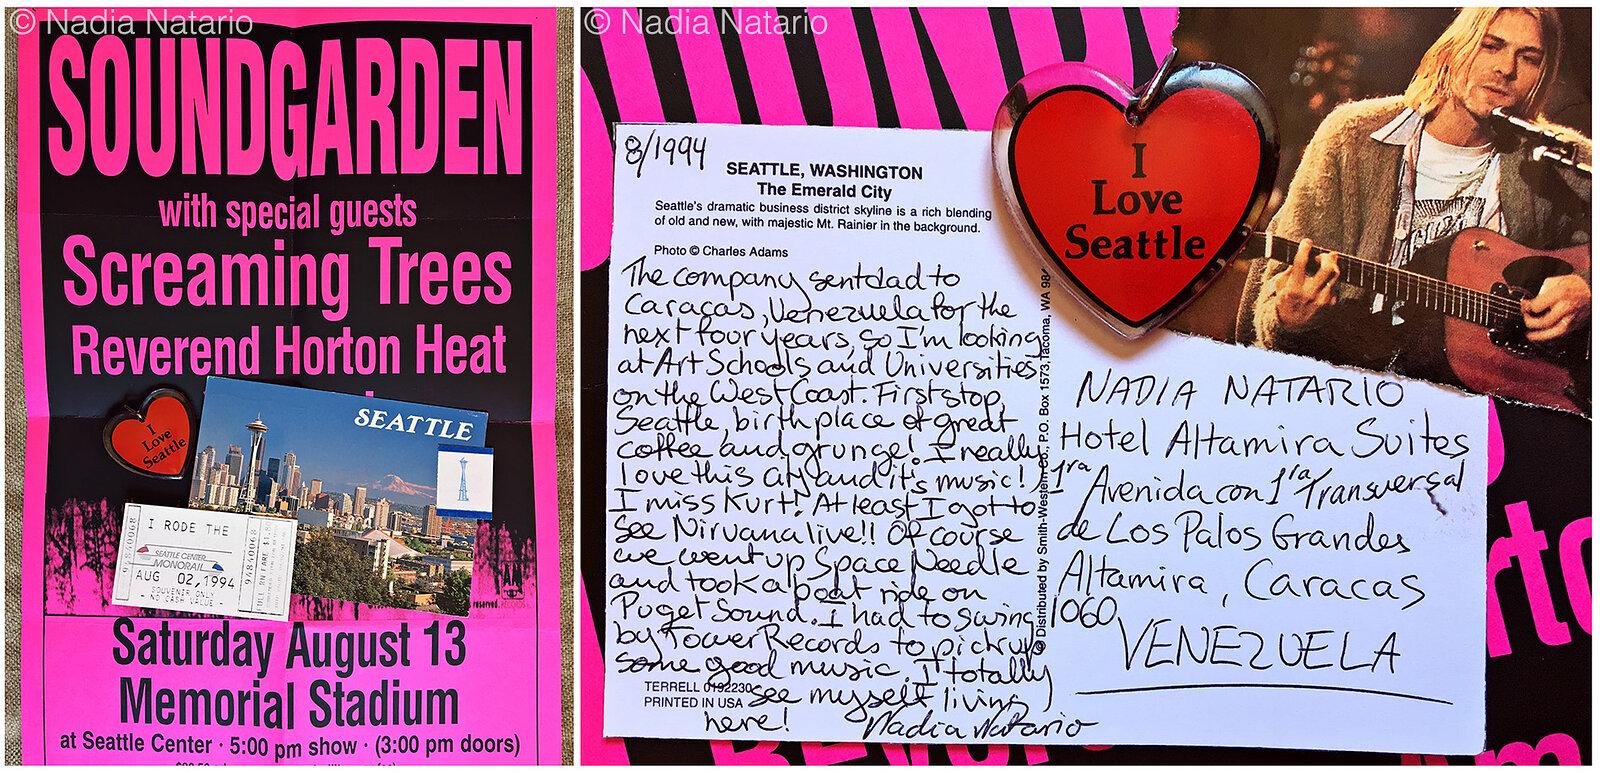 Postcards to Myself - Seattle, U.S.A, 1994